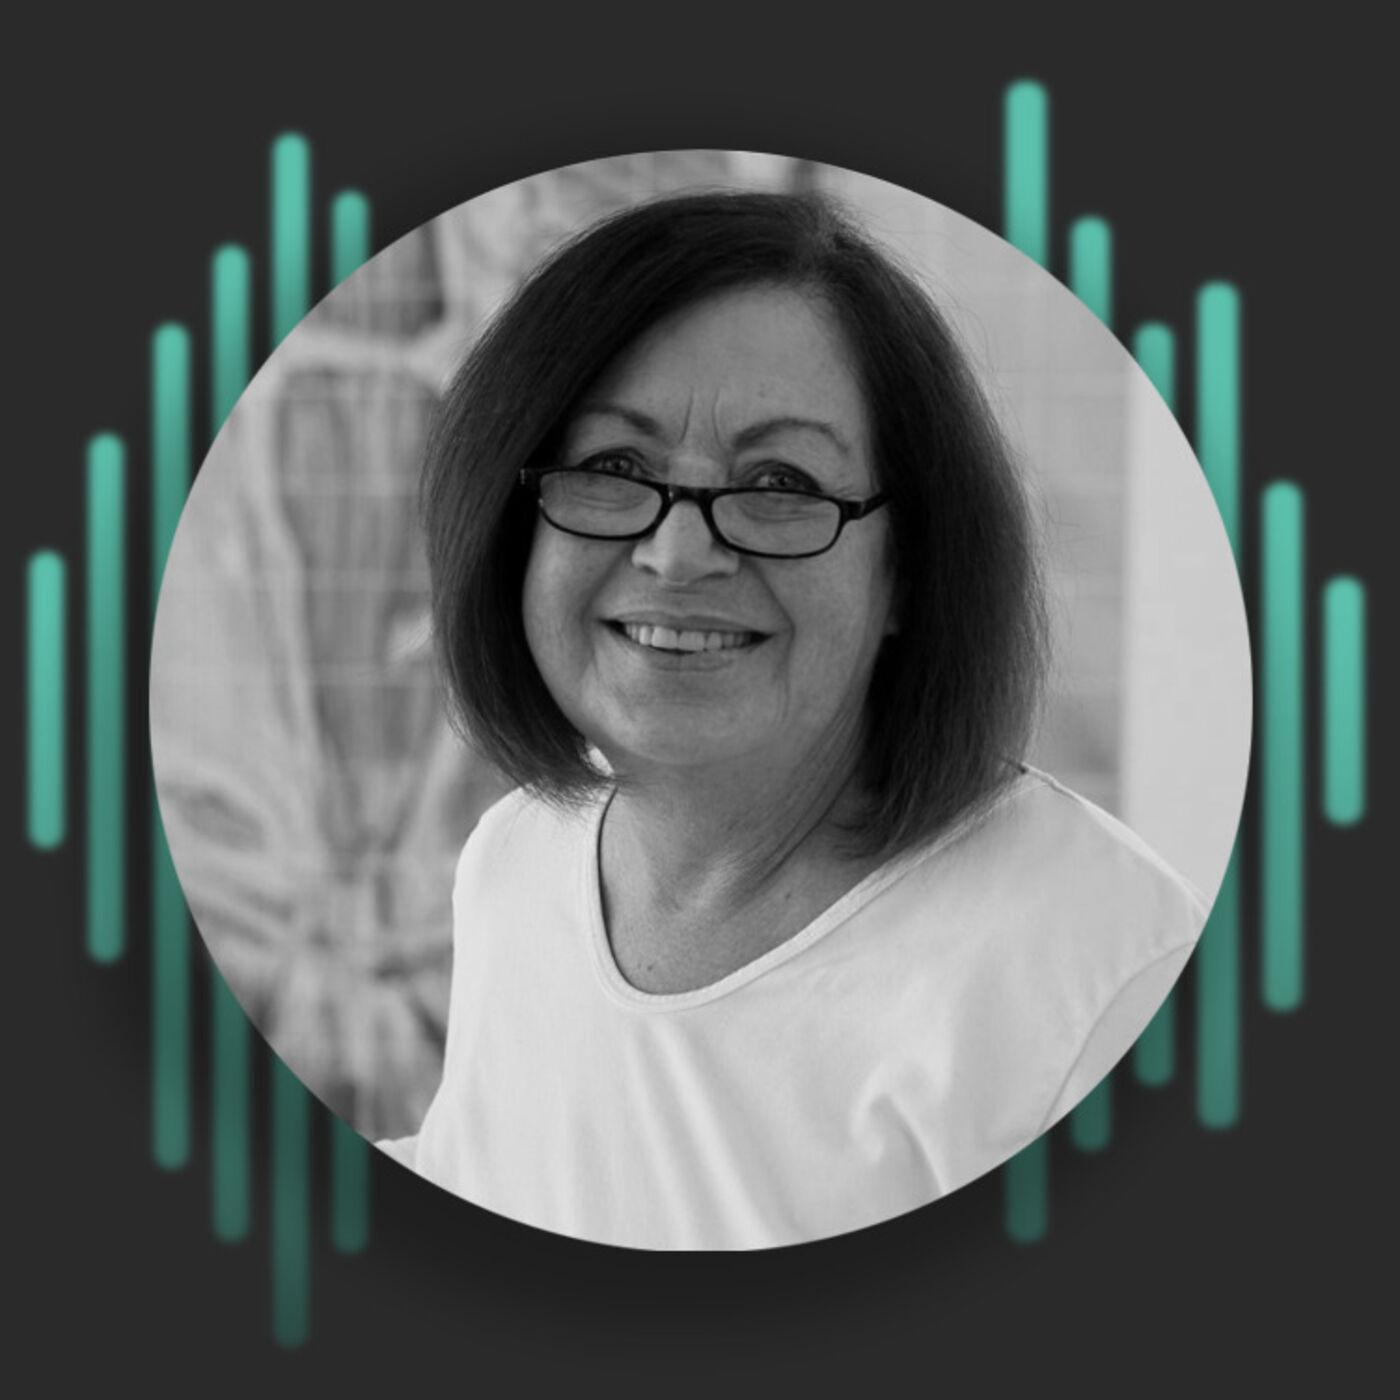 Episode 11: Janette Martin M.ED Director of D.O. Admissions